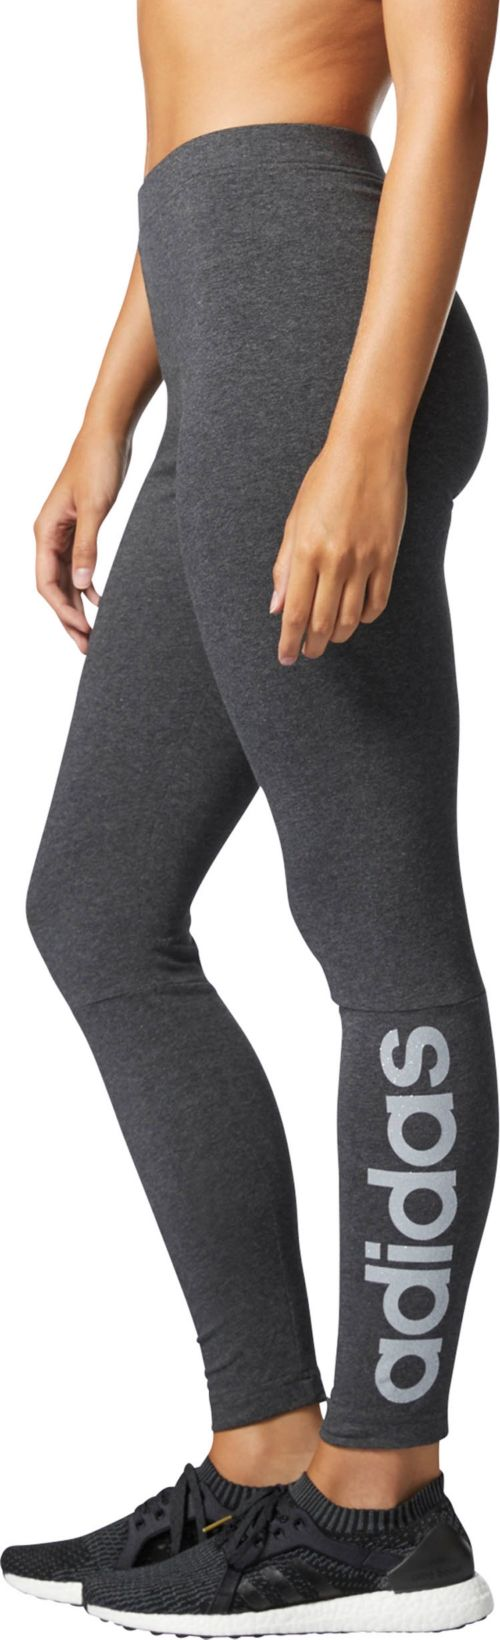 c6acb8c054b adidas Women s Essentials Linear Tights